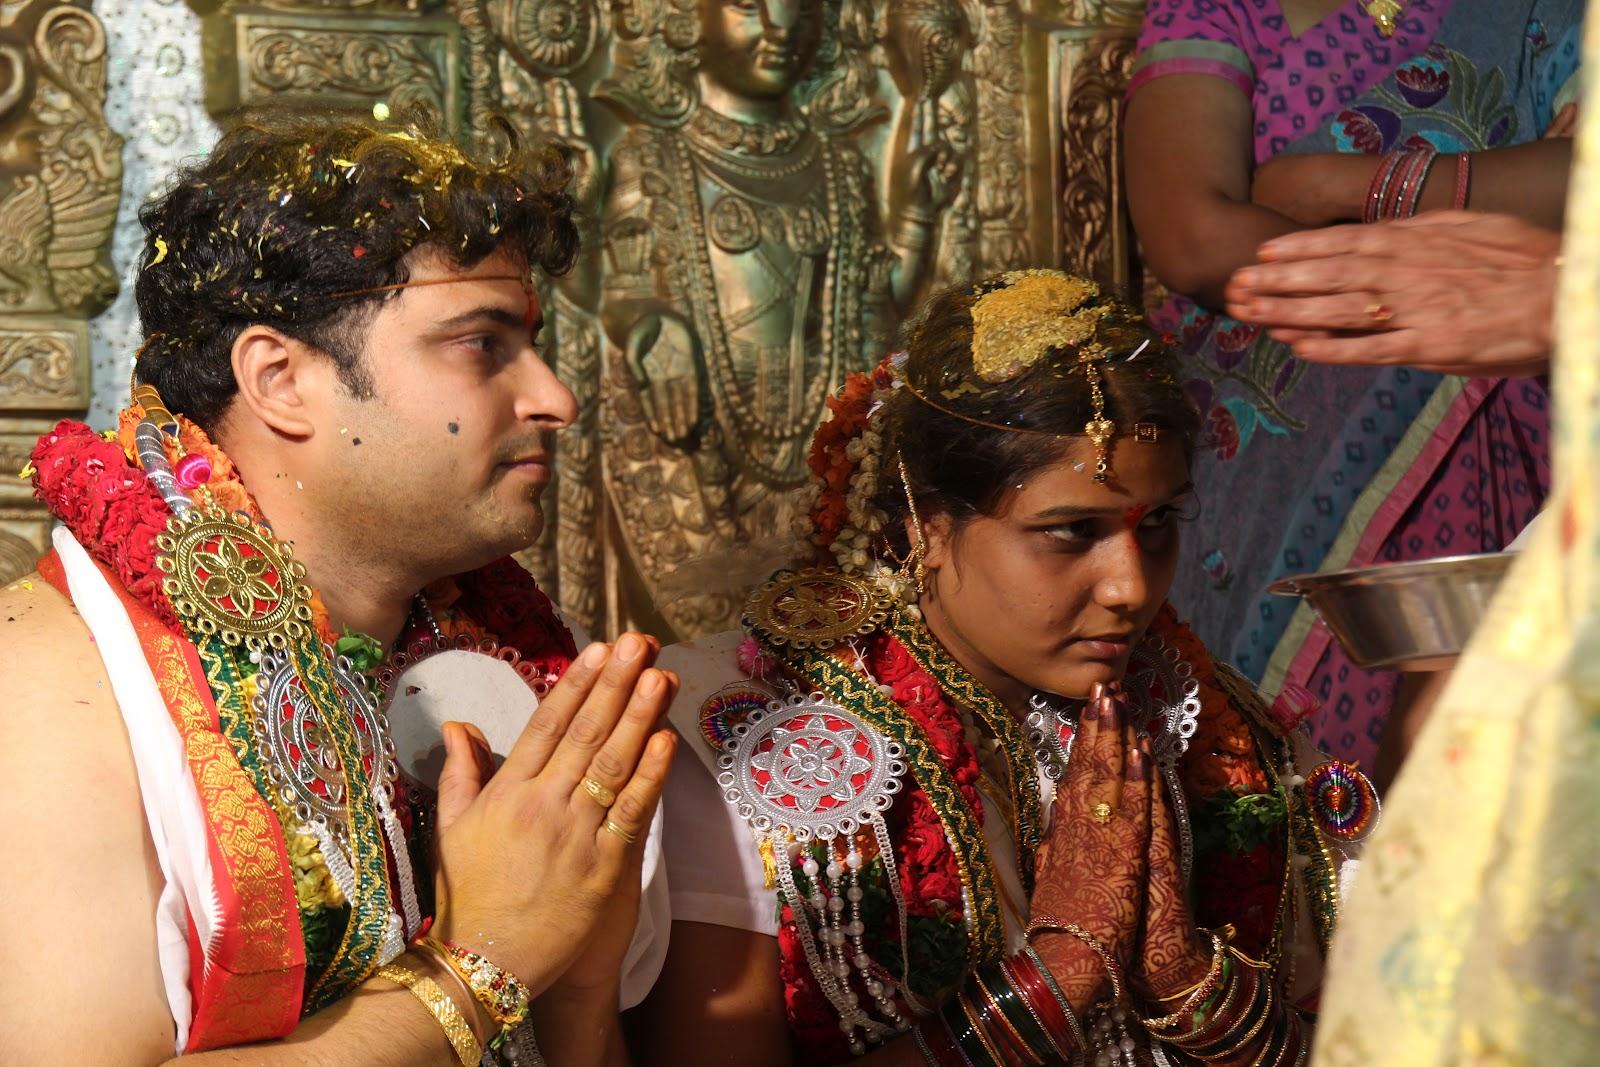 Incredible India 2012